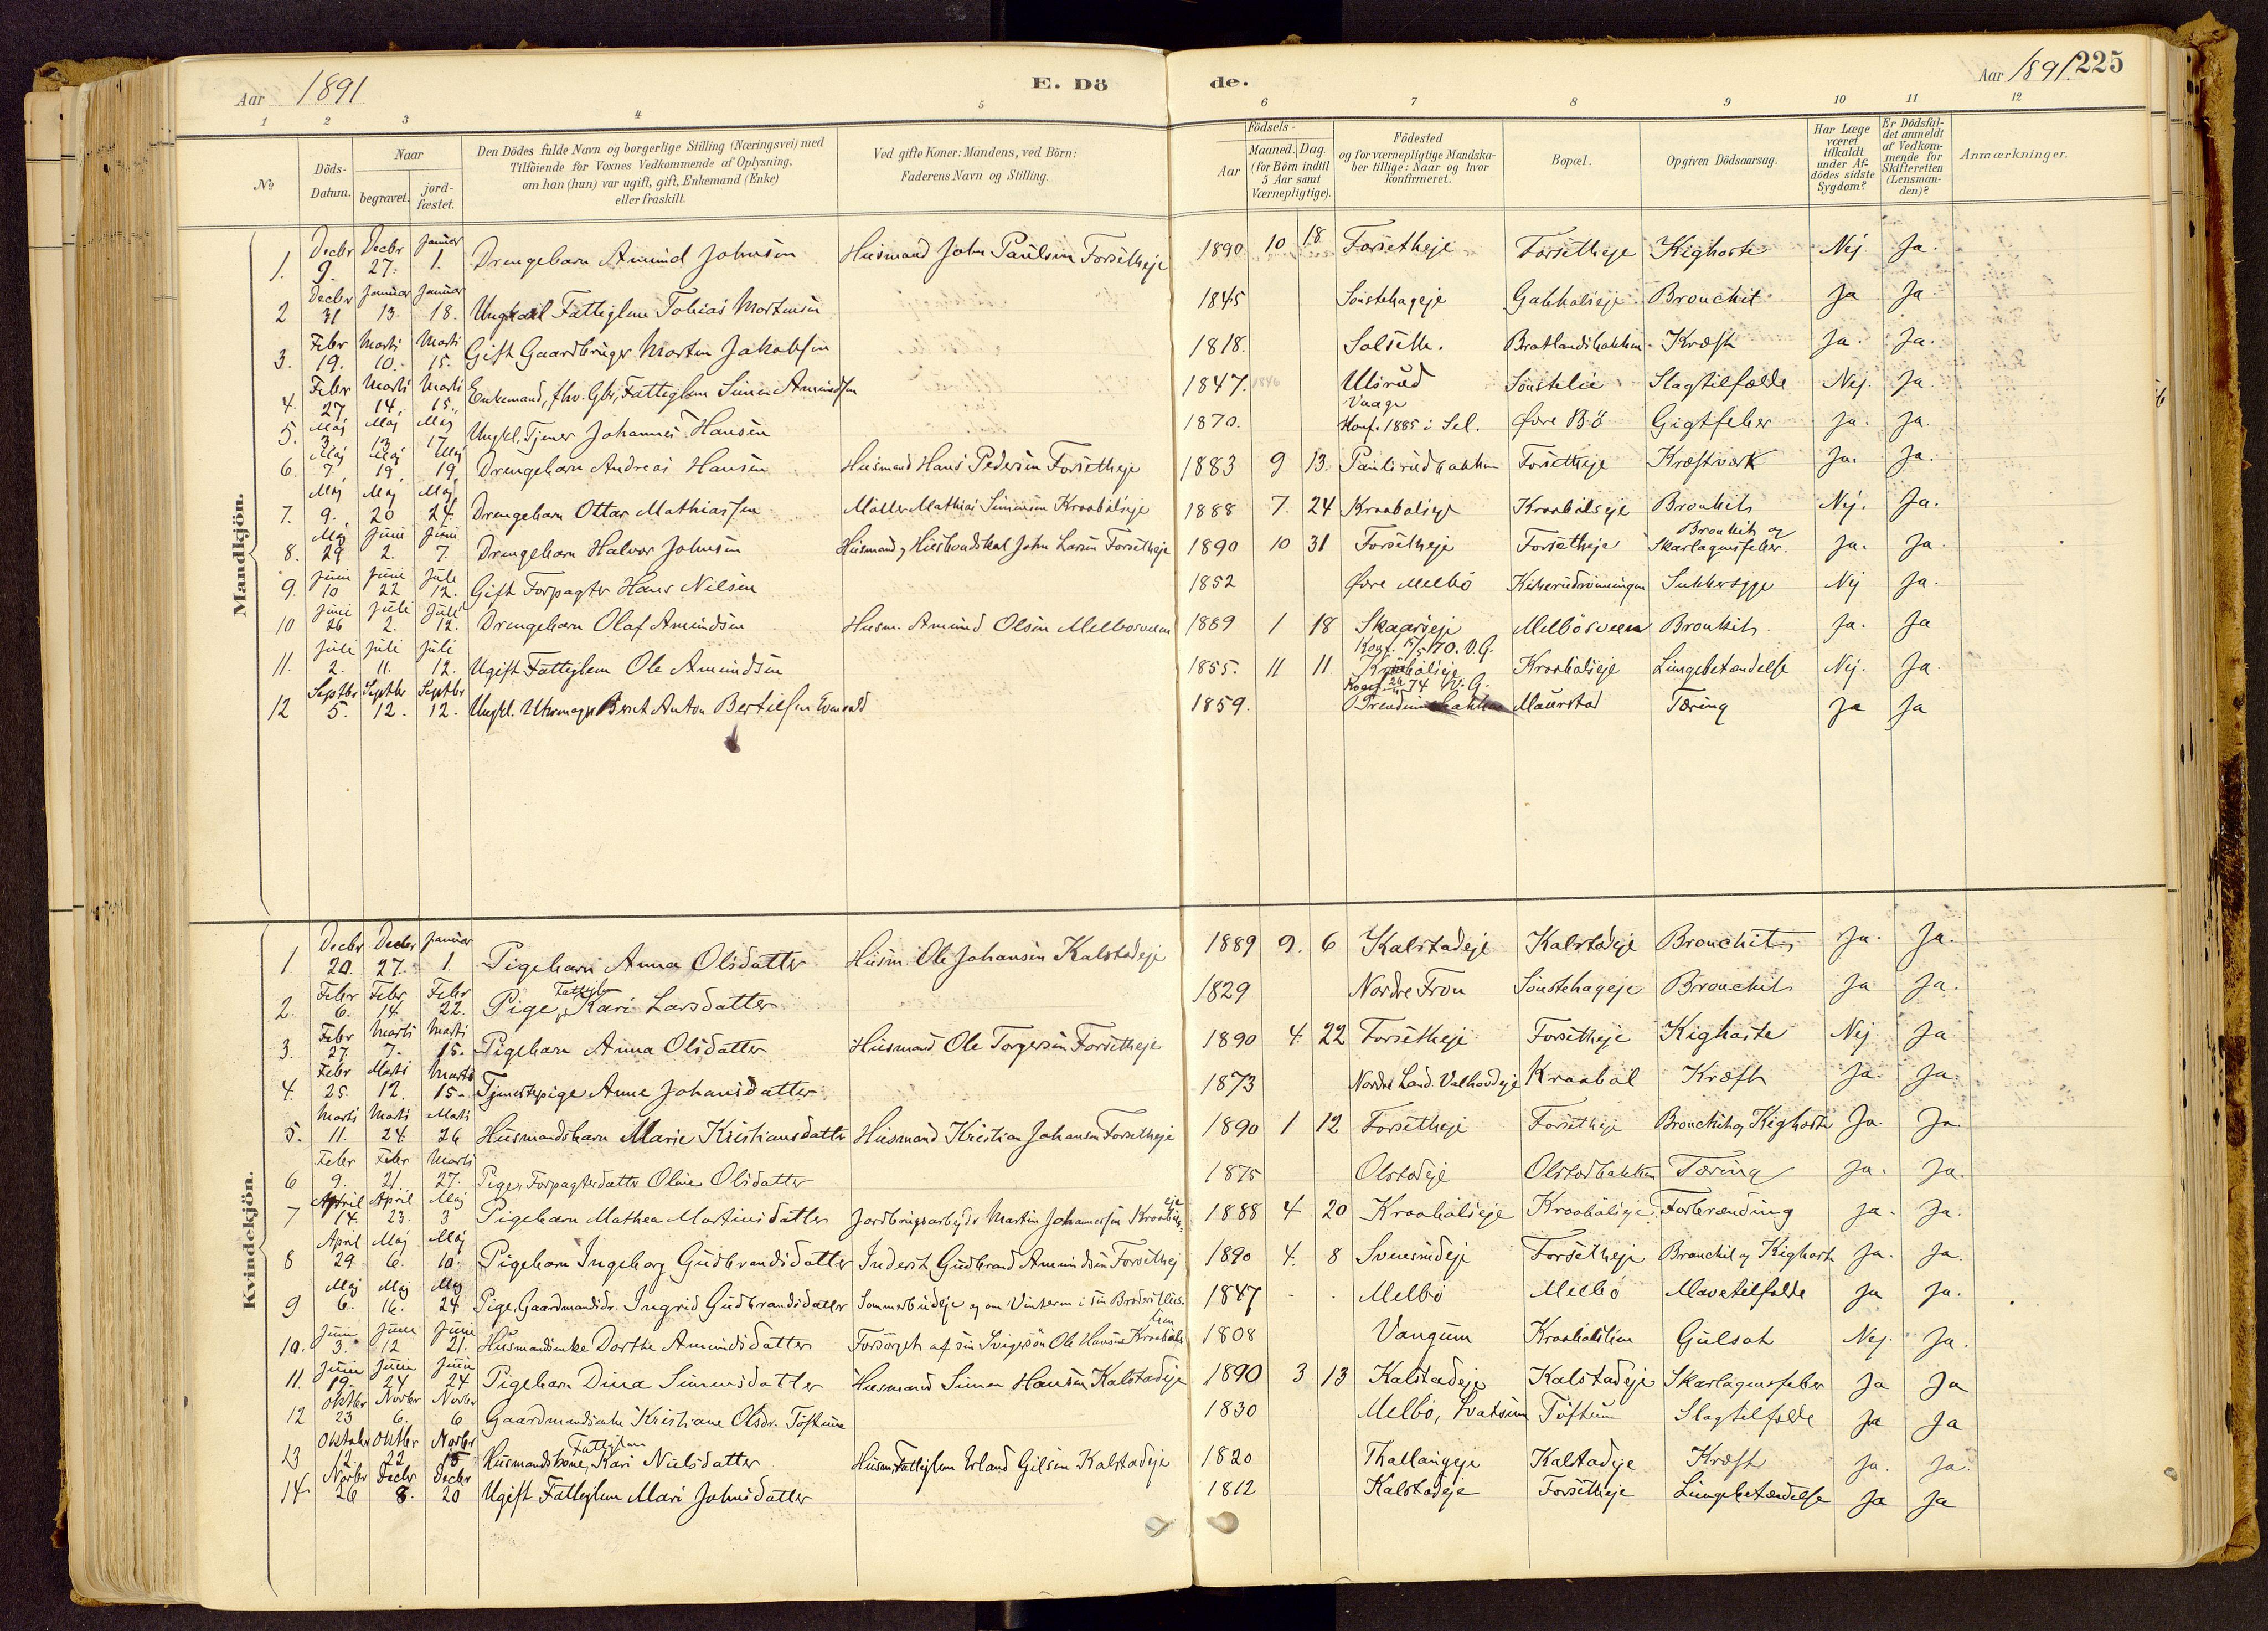 SAH, Vestre Gausdal prestekontor, Ministerialbok nr. 1, 1887-1914, s. 225